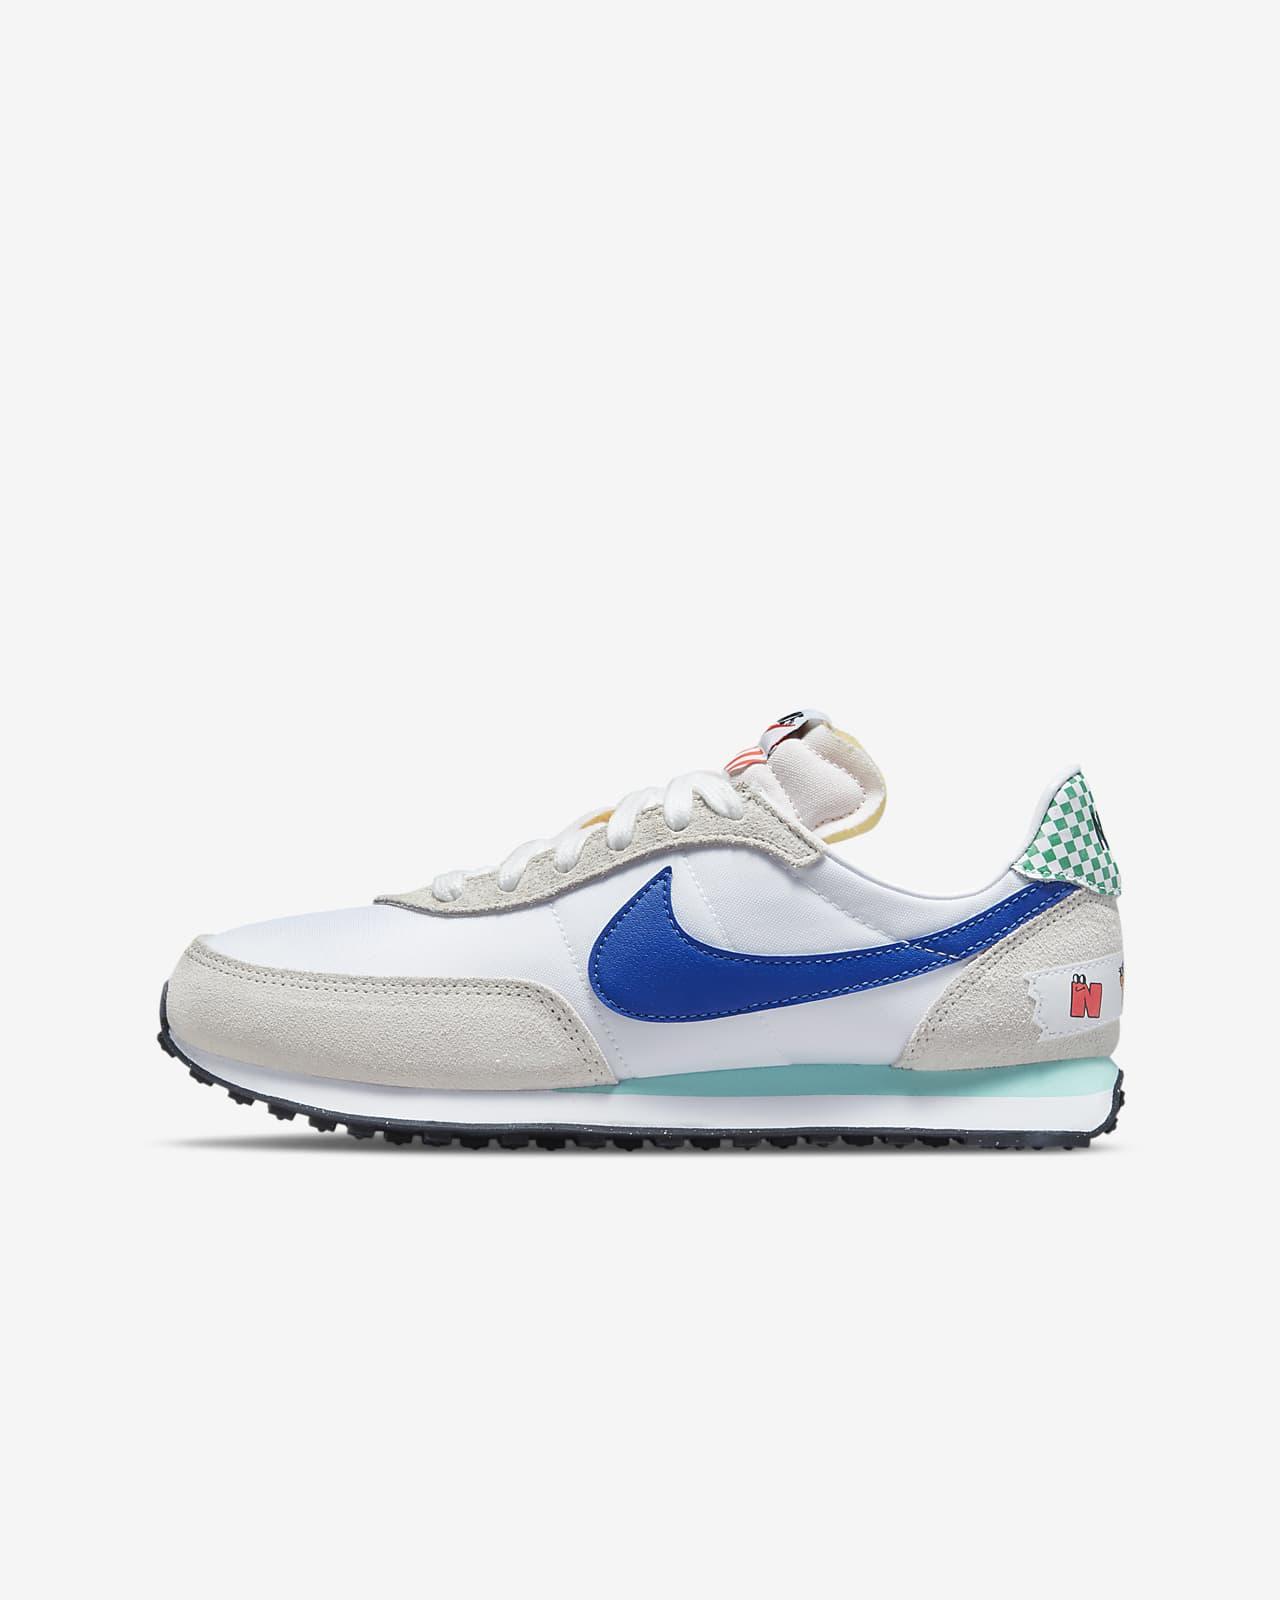 Nike Waffle Trainer 2 BG 大童运动童鞋